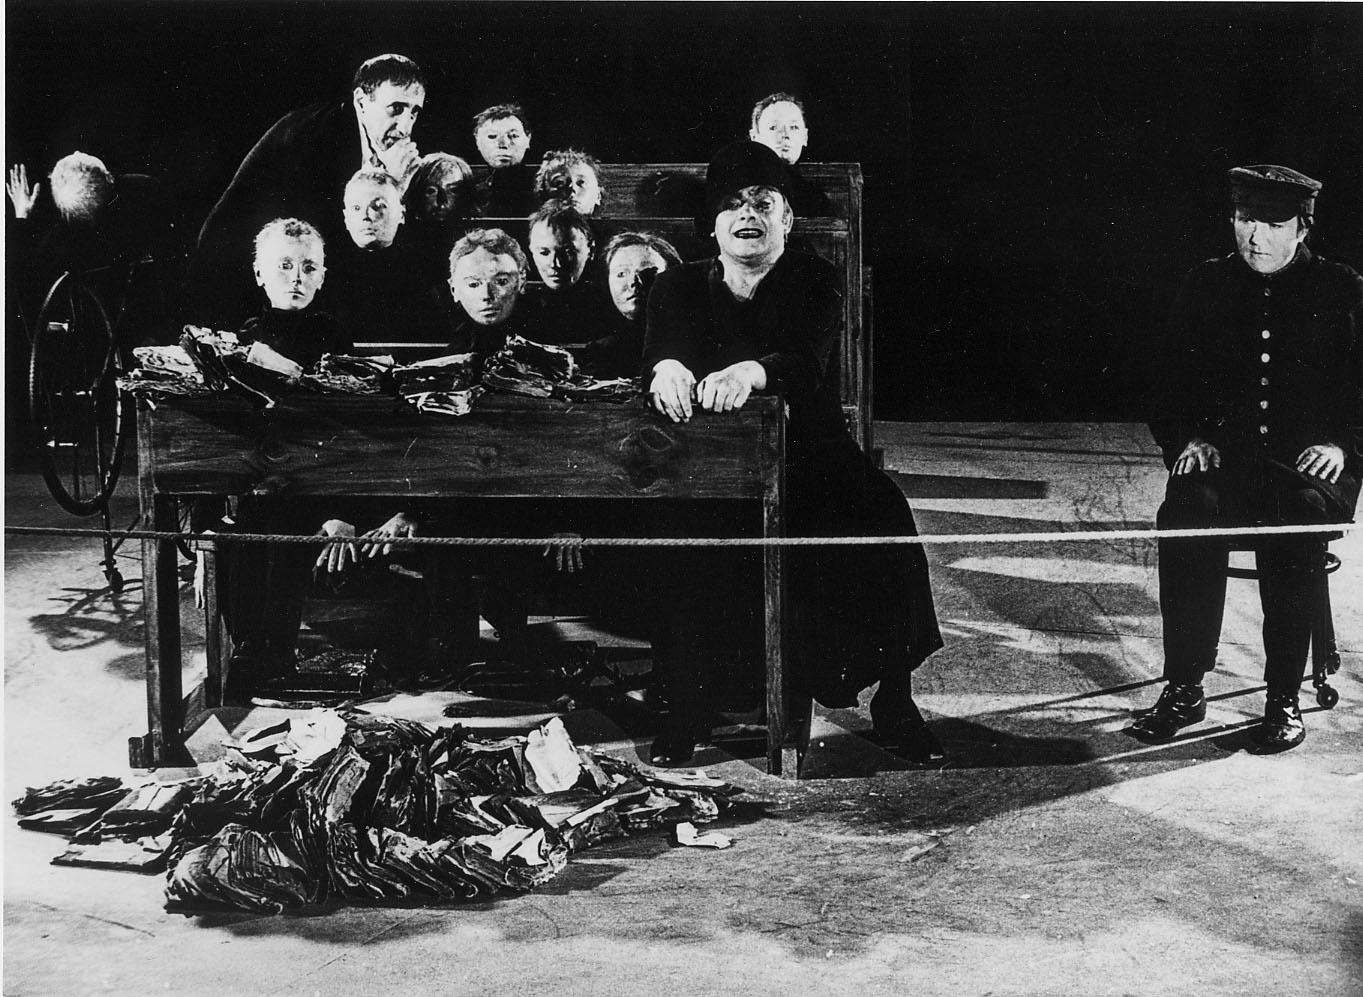 La classe morta, Tadeusz Kantor, 1975